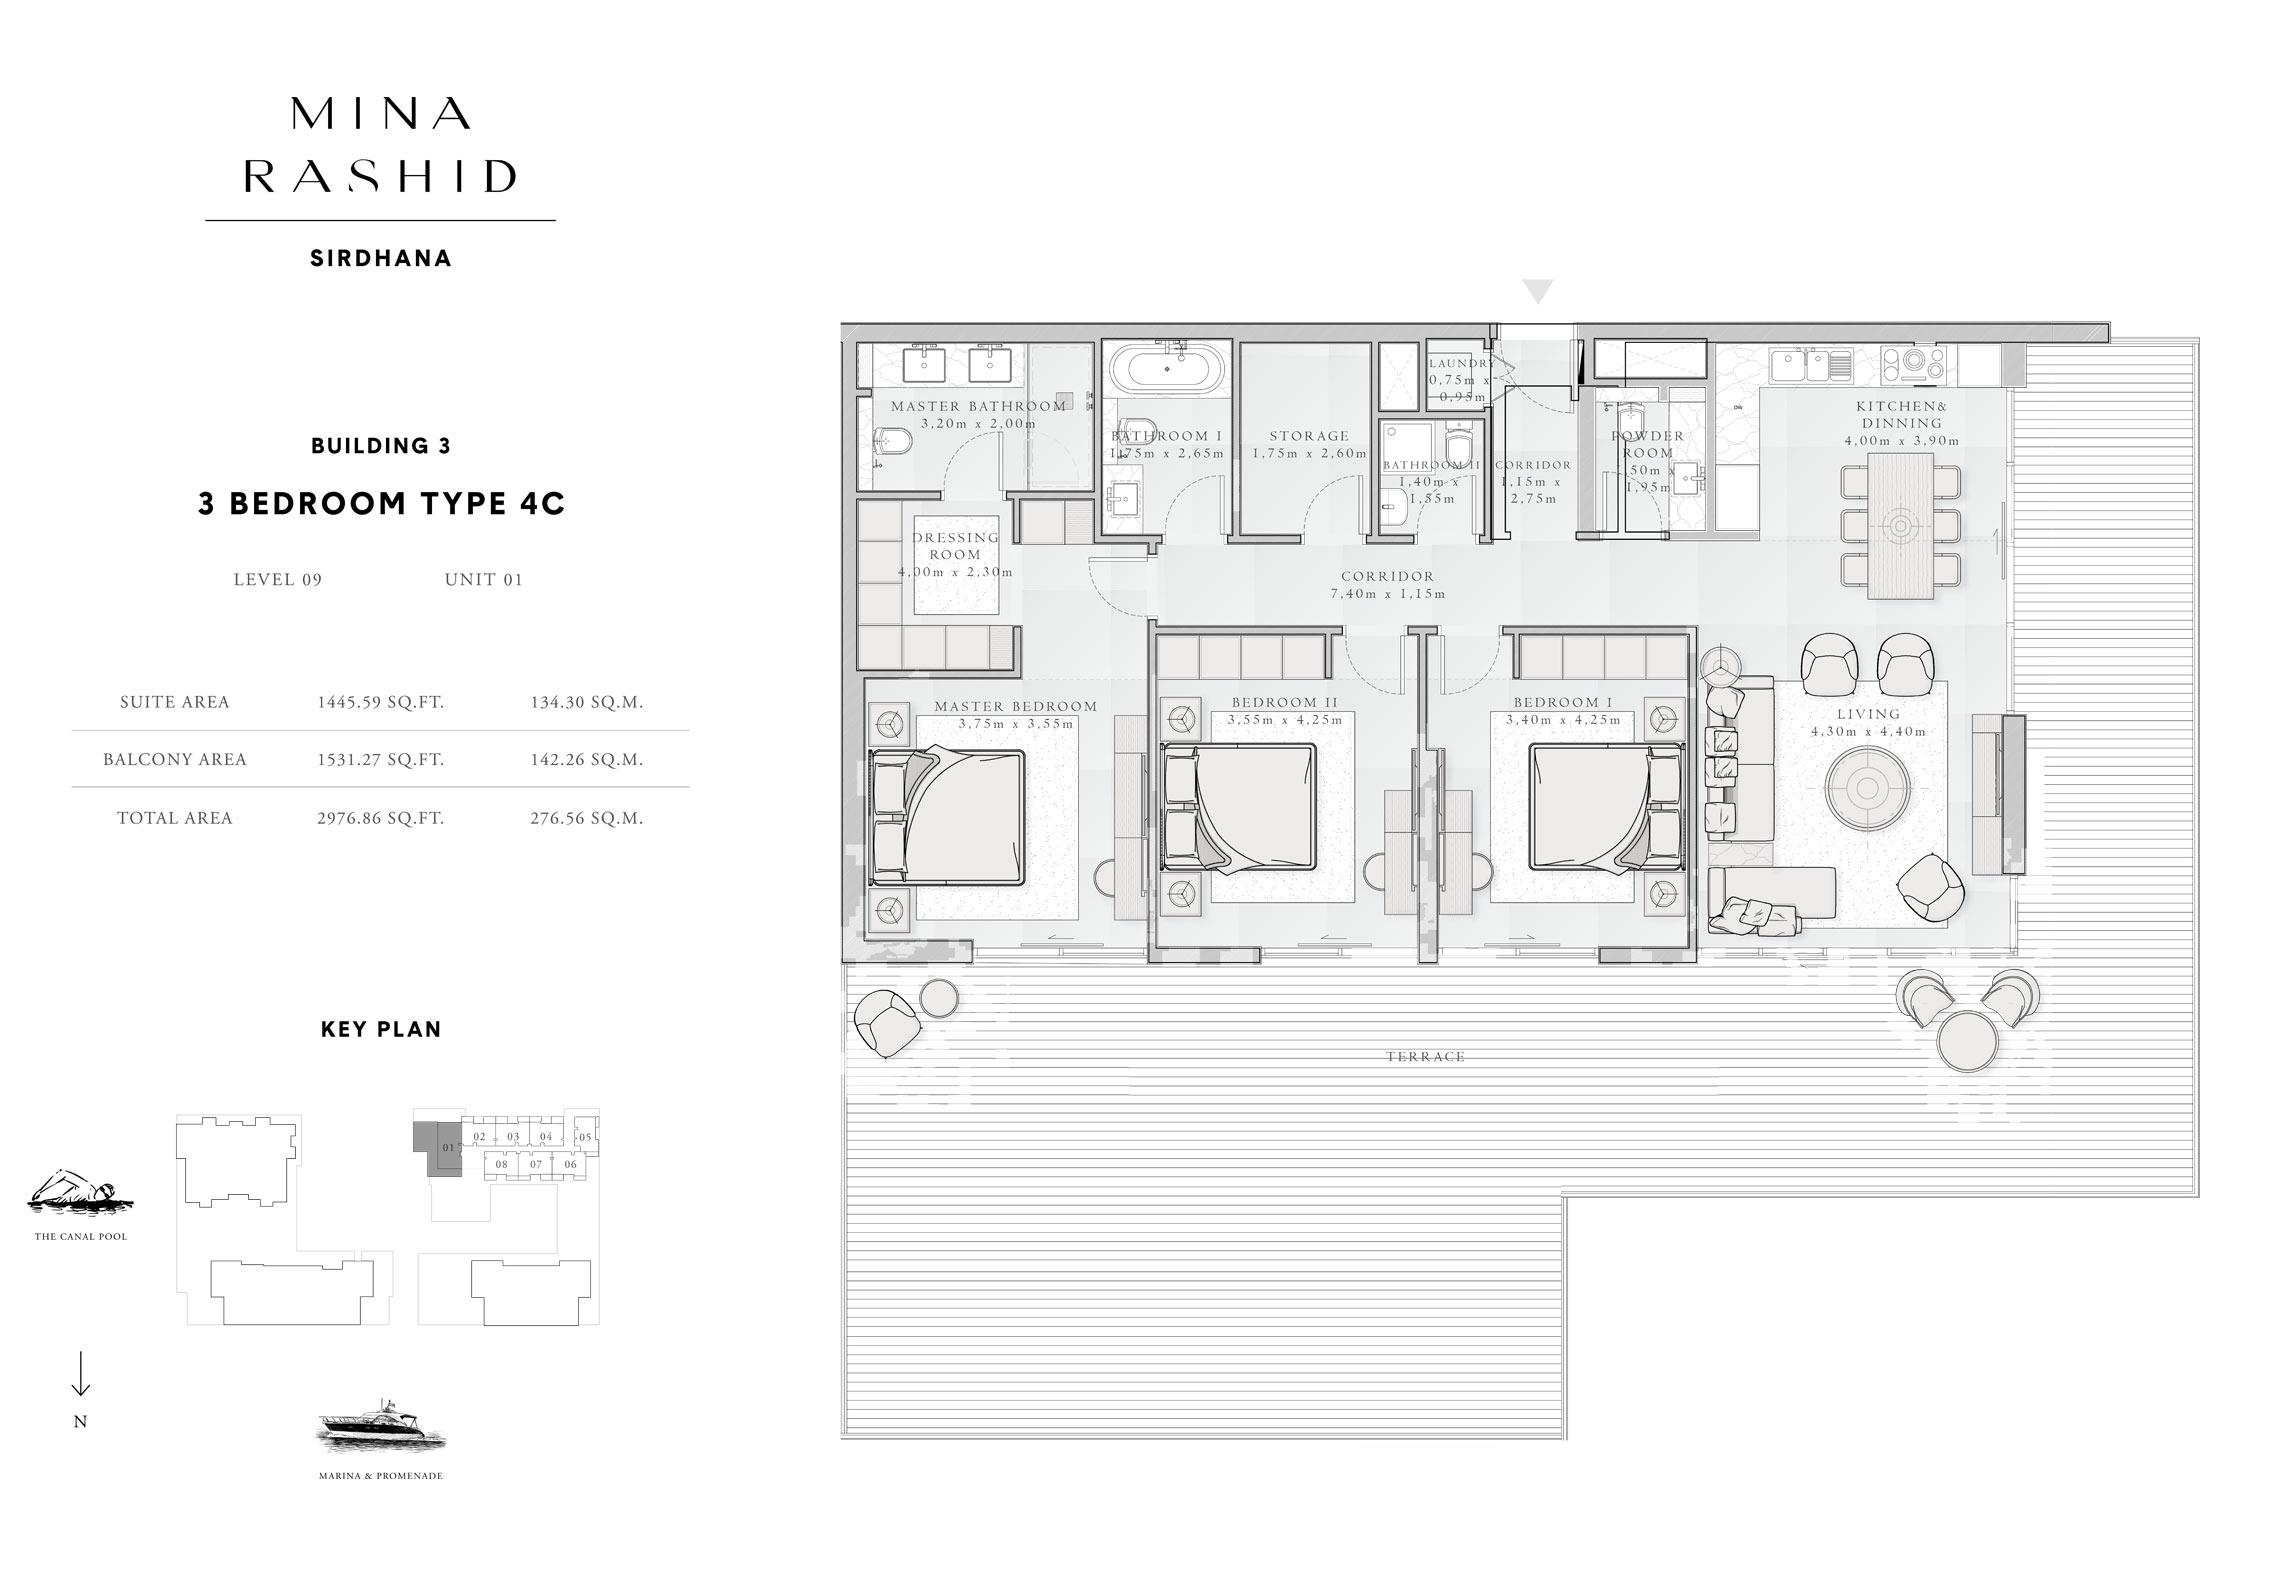 3-Bedroom-Type-4C, Building-4, Level-9, Size-2976-Sq-Ft